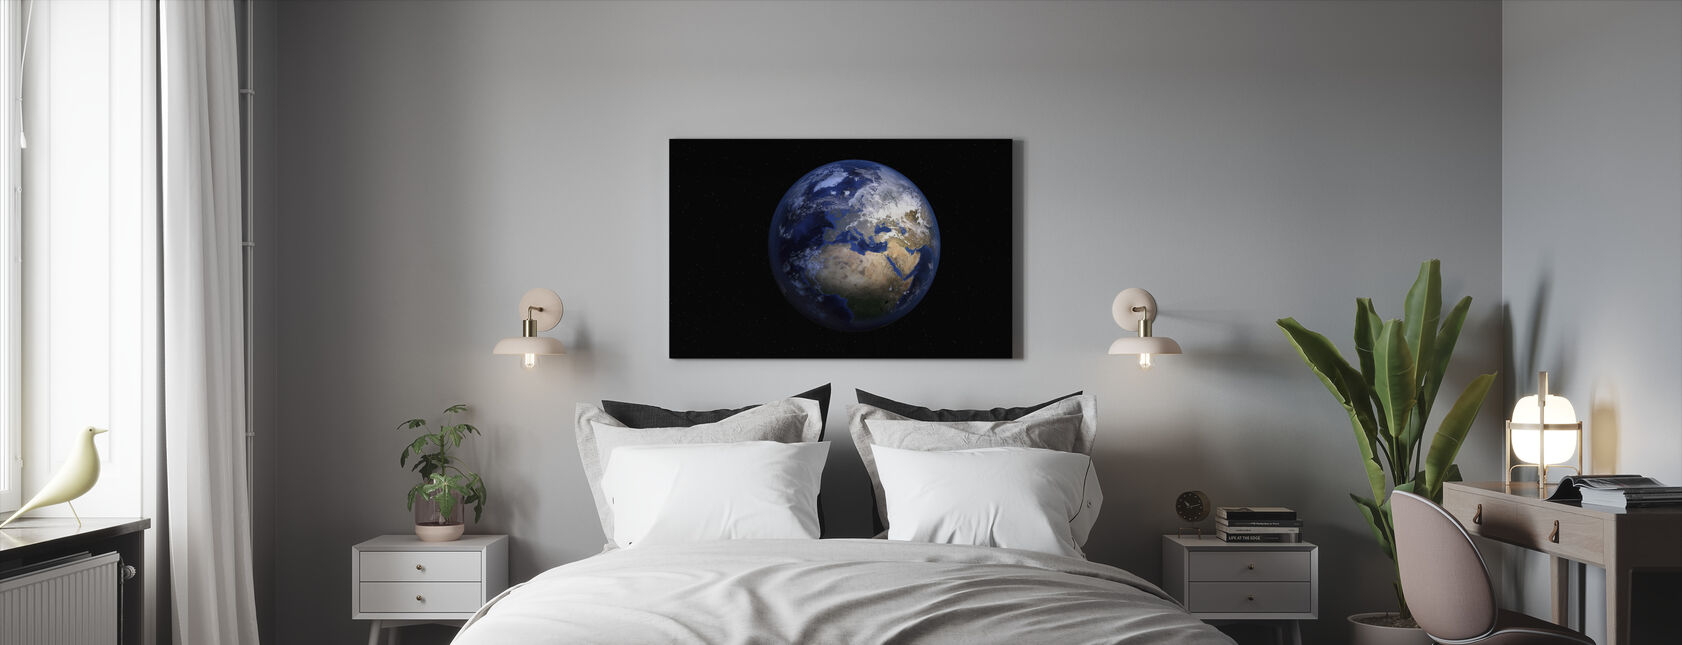 Planeet Aarde - Canvas print - Slaapkamer